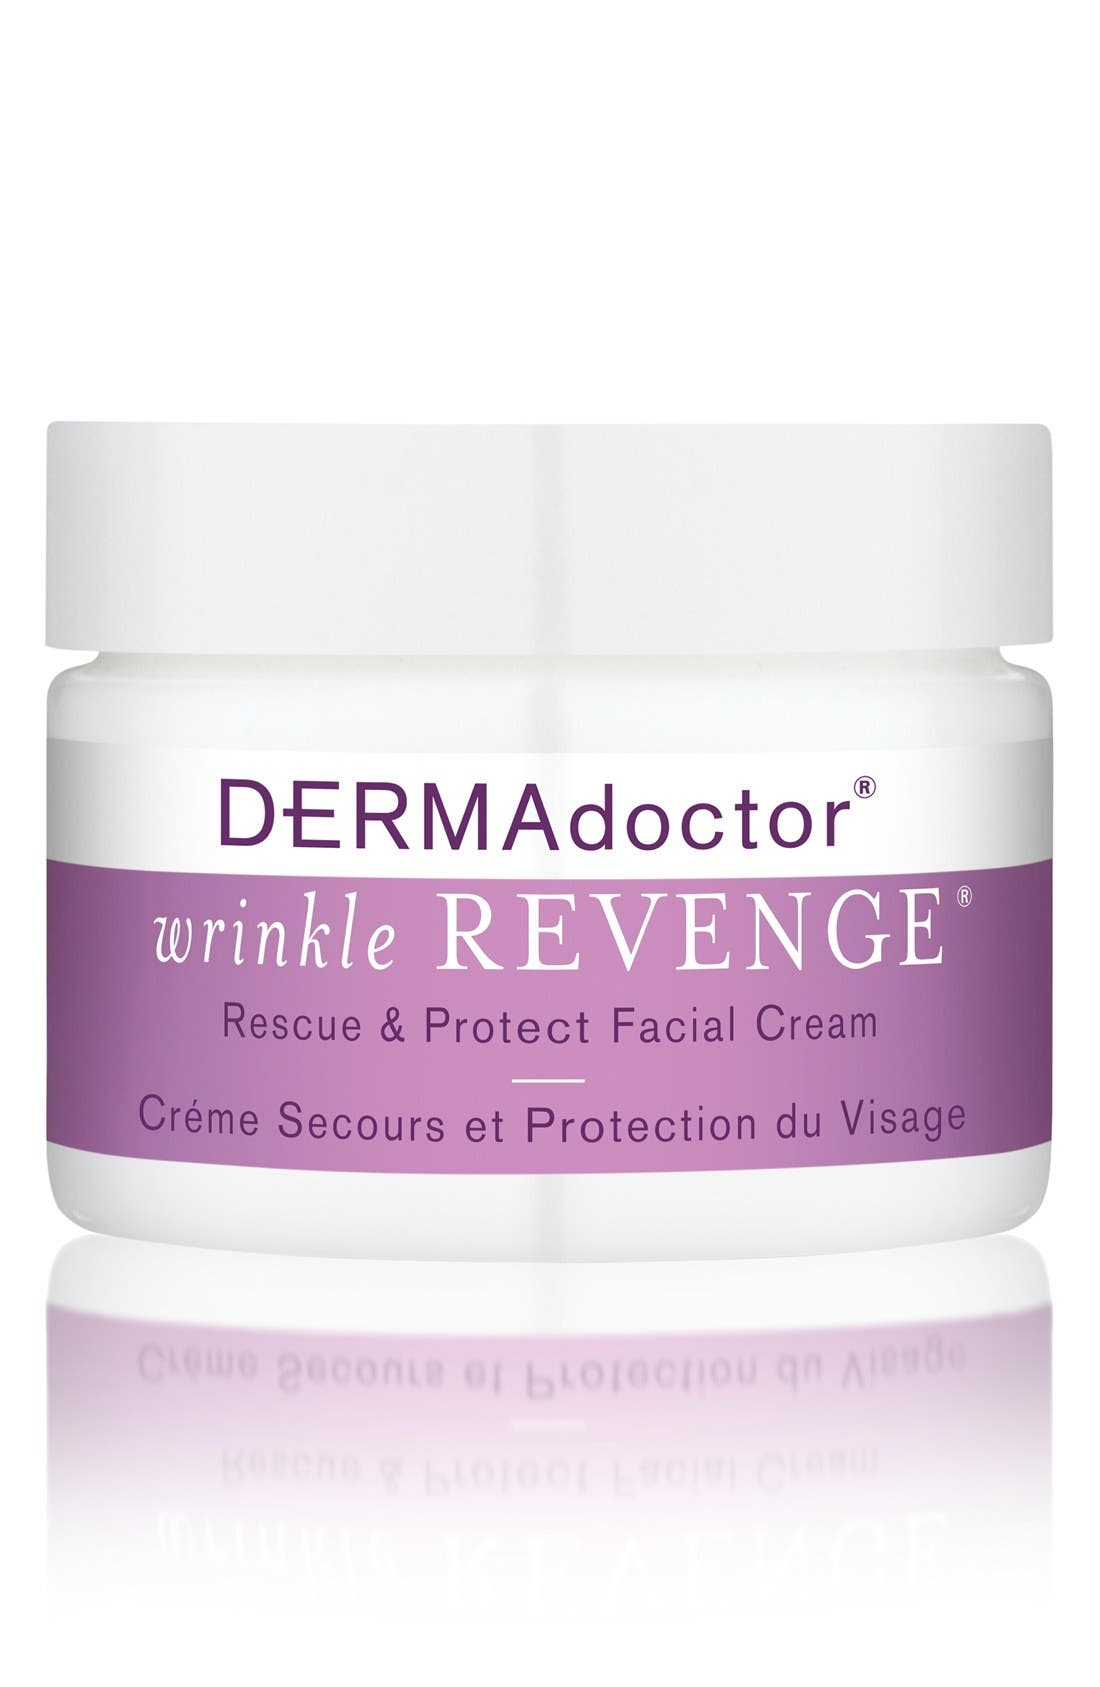 'wrinkle REVENGE<sup>®</sup>' Rescue & Protect Facial Cream,                         Main,                         color, NO COLOR